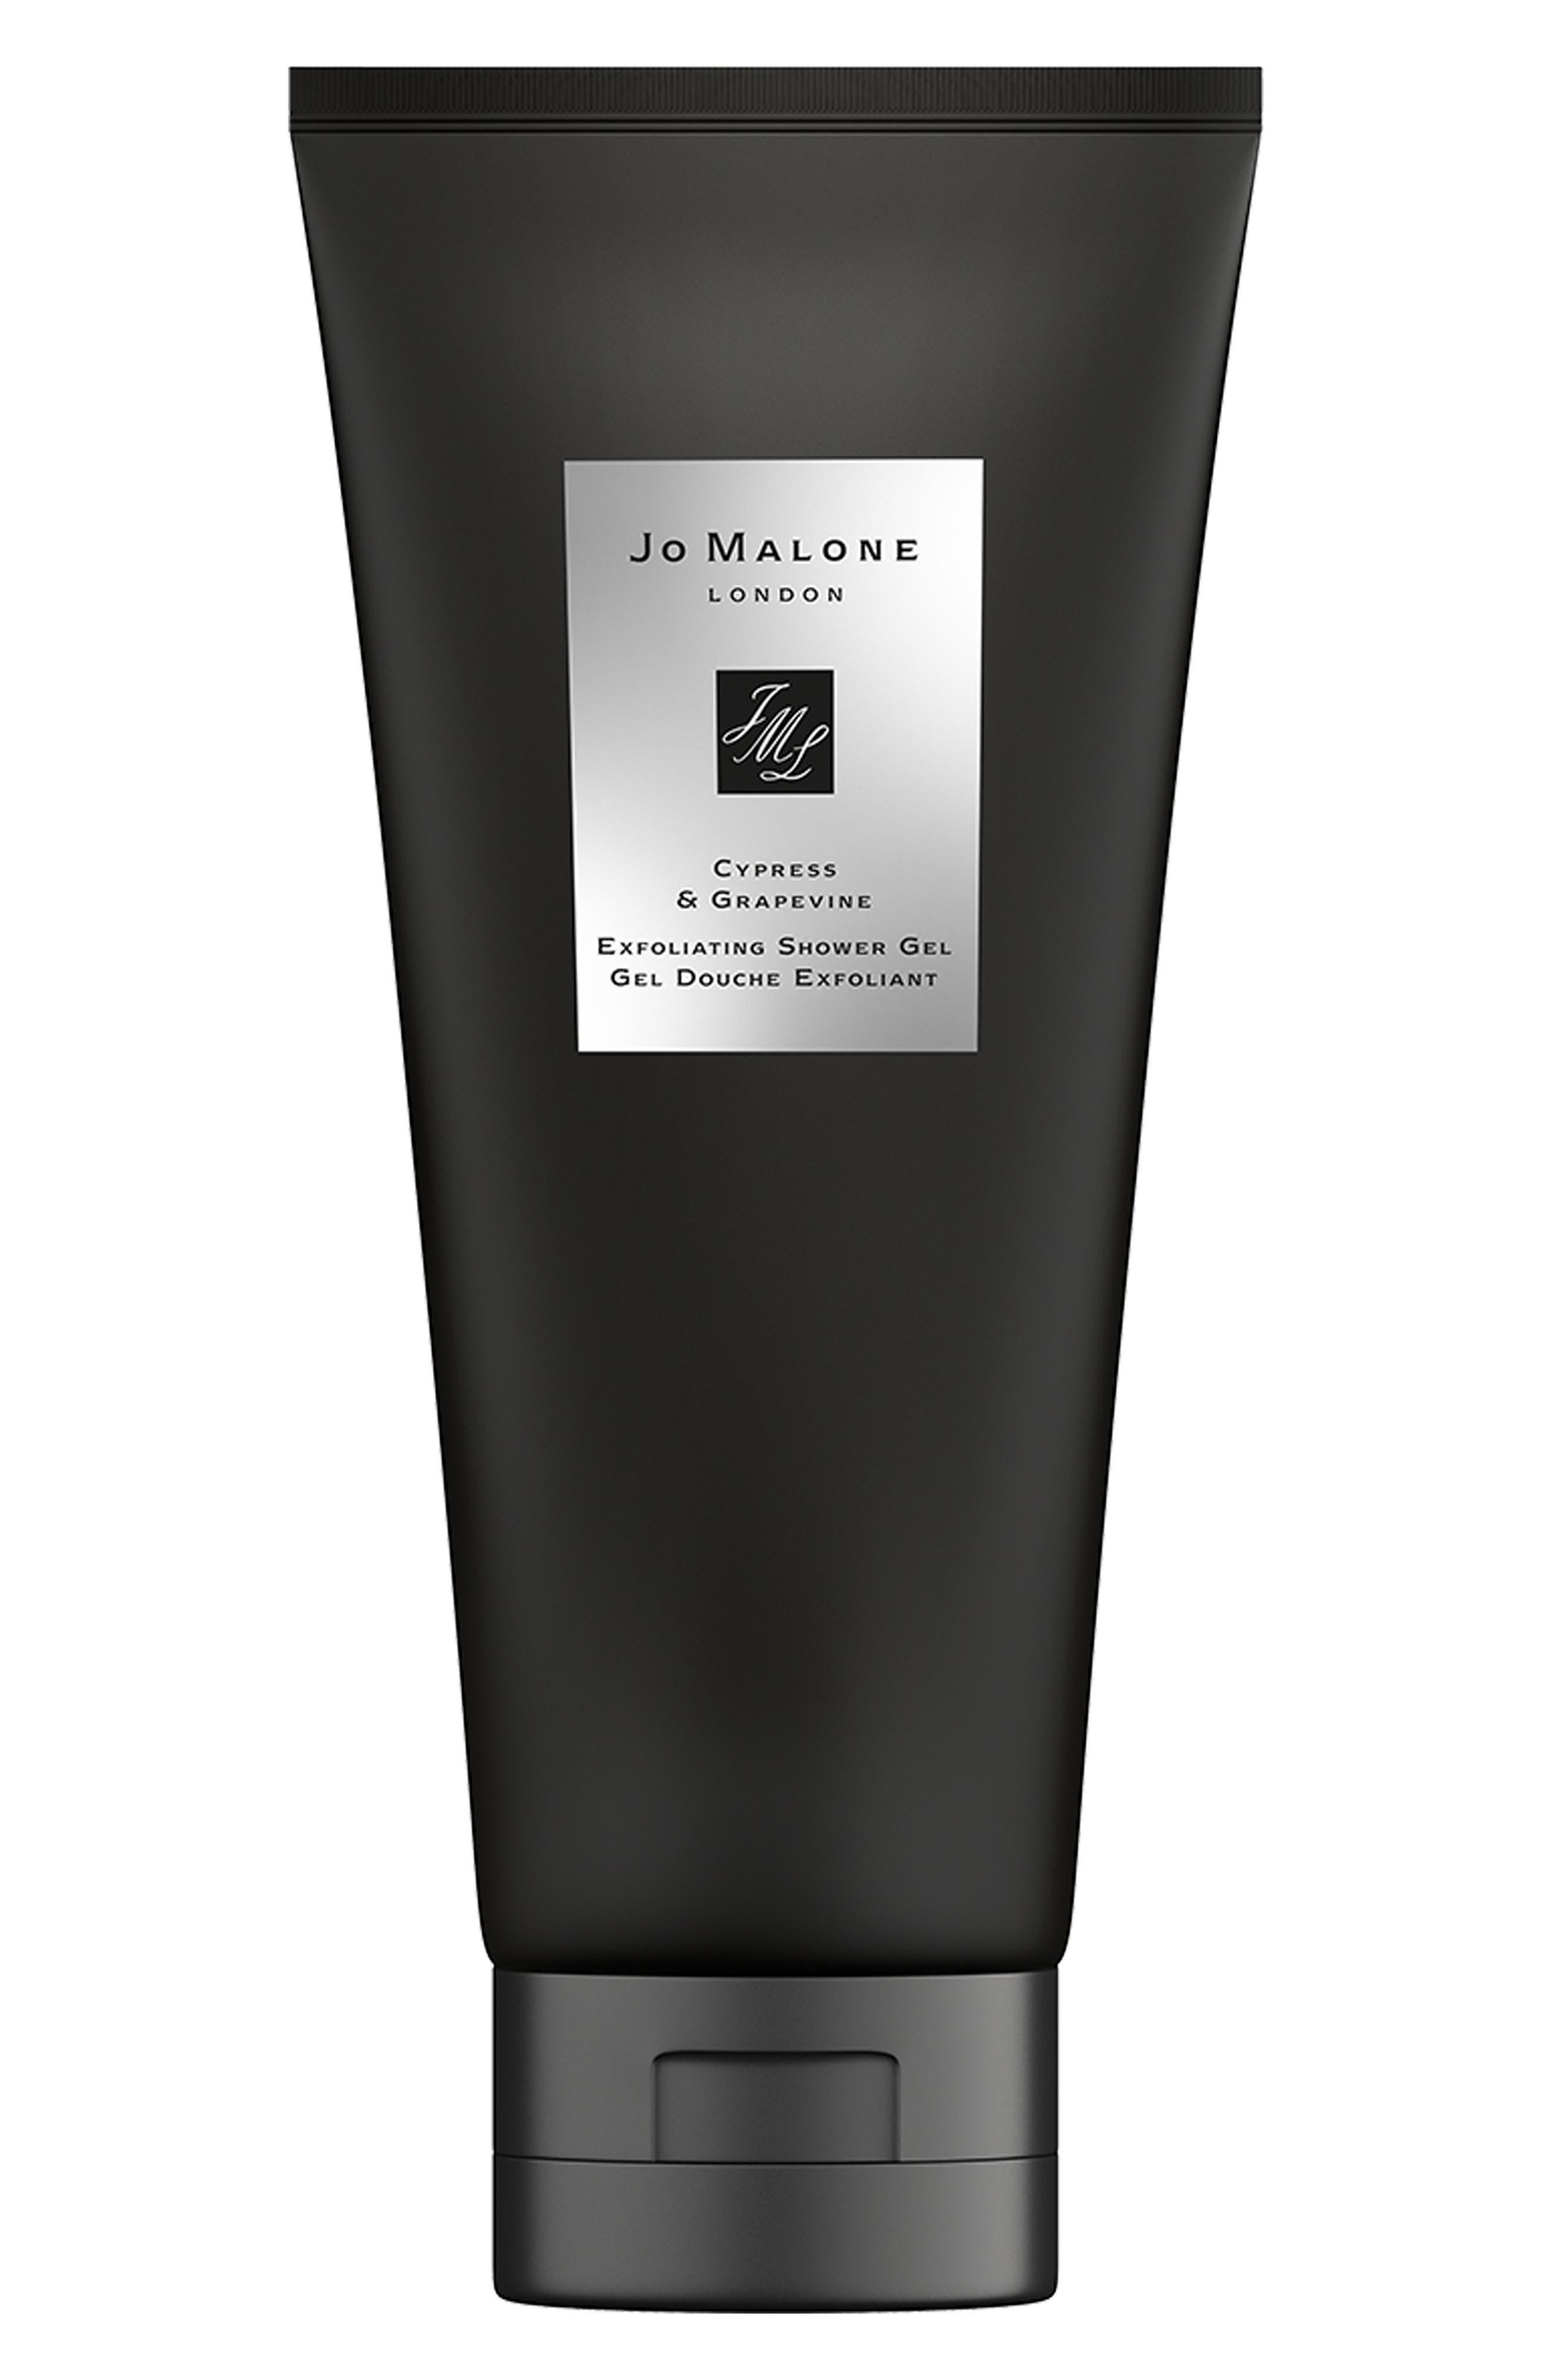 Jo Malone London(TM) Cypress & Grapevine Exfoliating Shower Gel